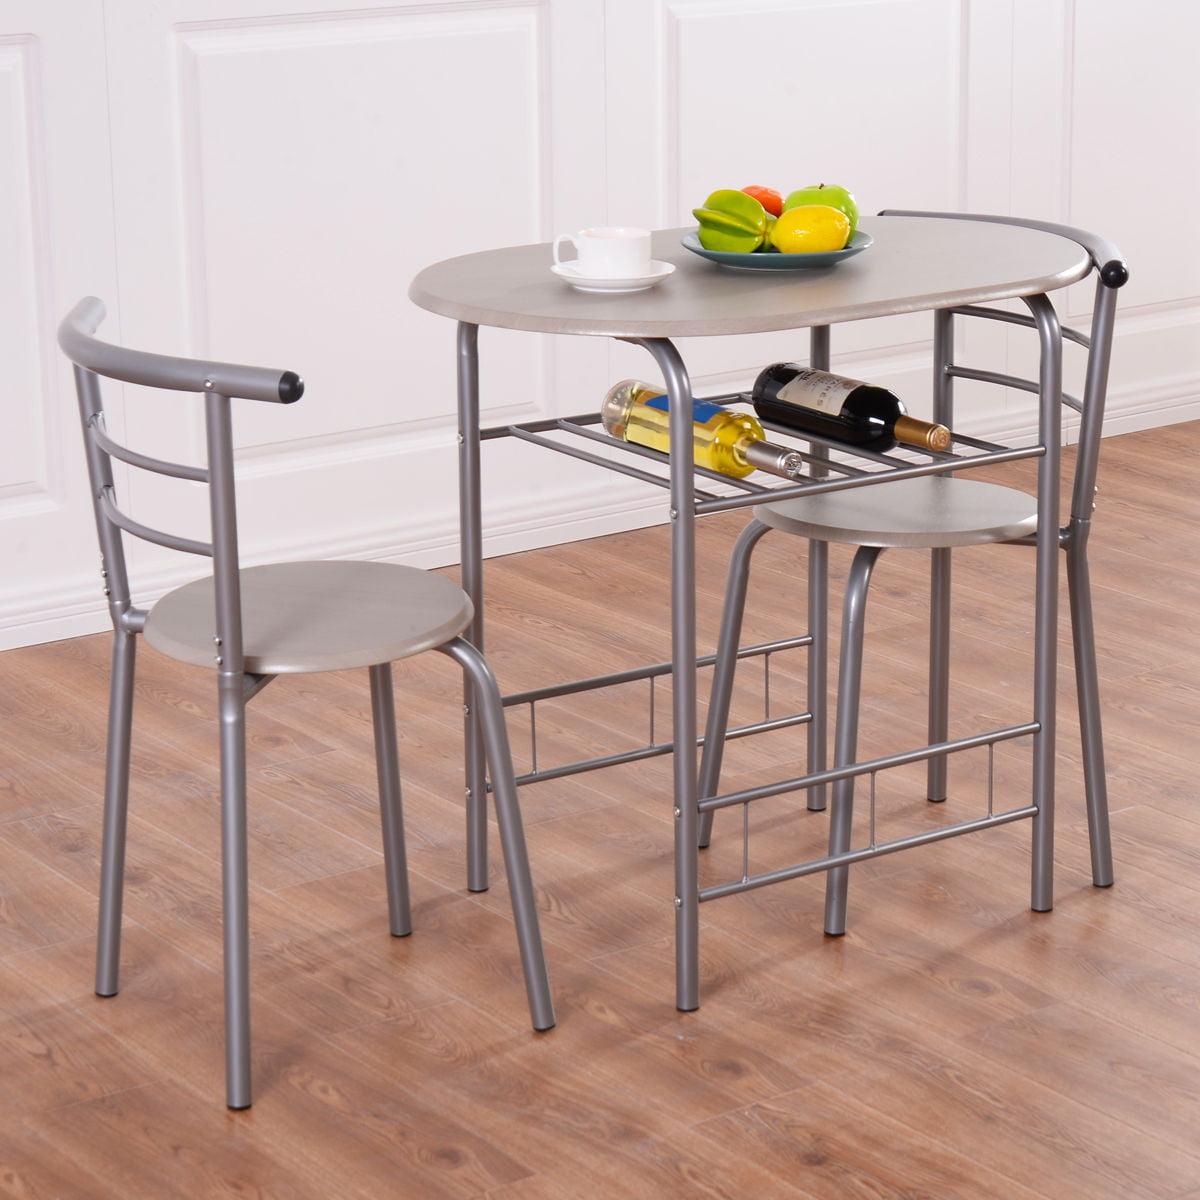 ae418d49d Costway 3 Piece Dining Set Table 2 Chairs Bistro Pub Home Kitchen Breakfast  Furniture - Walmart.com